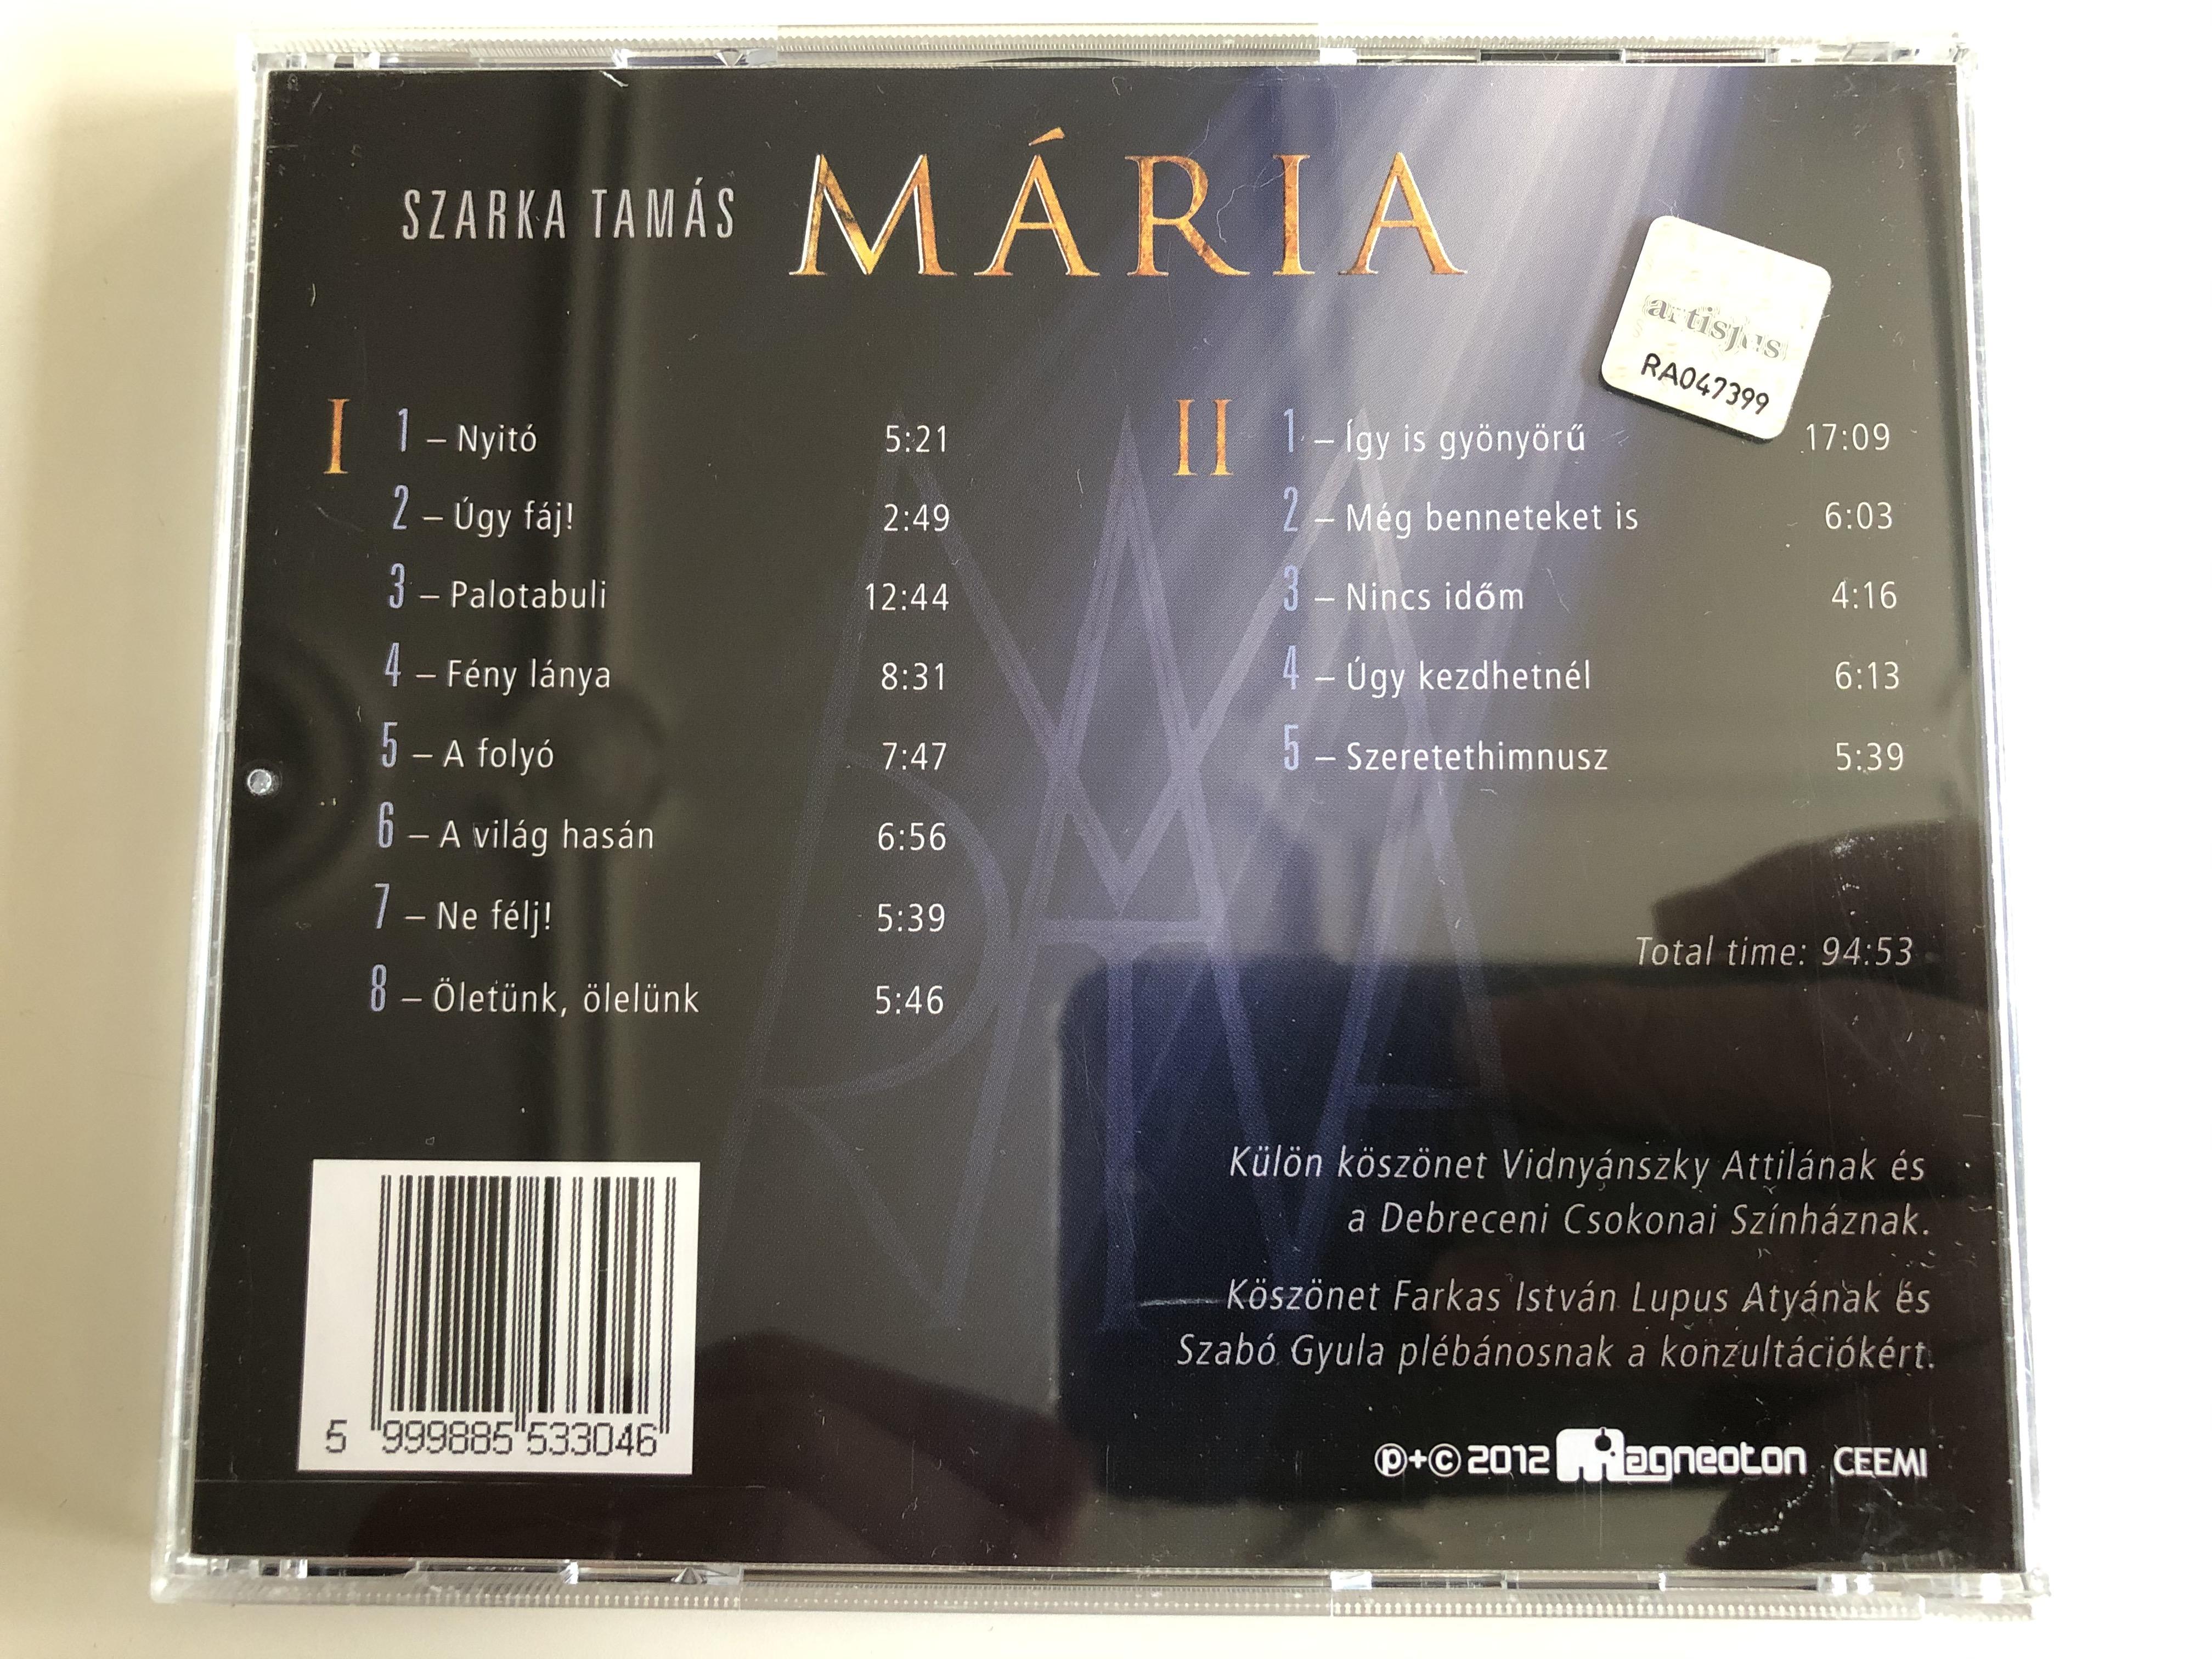 szarka-tamas-maria-musical-magneoton-2x-audio-cd-2012-5999885533046-6-.jpg